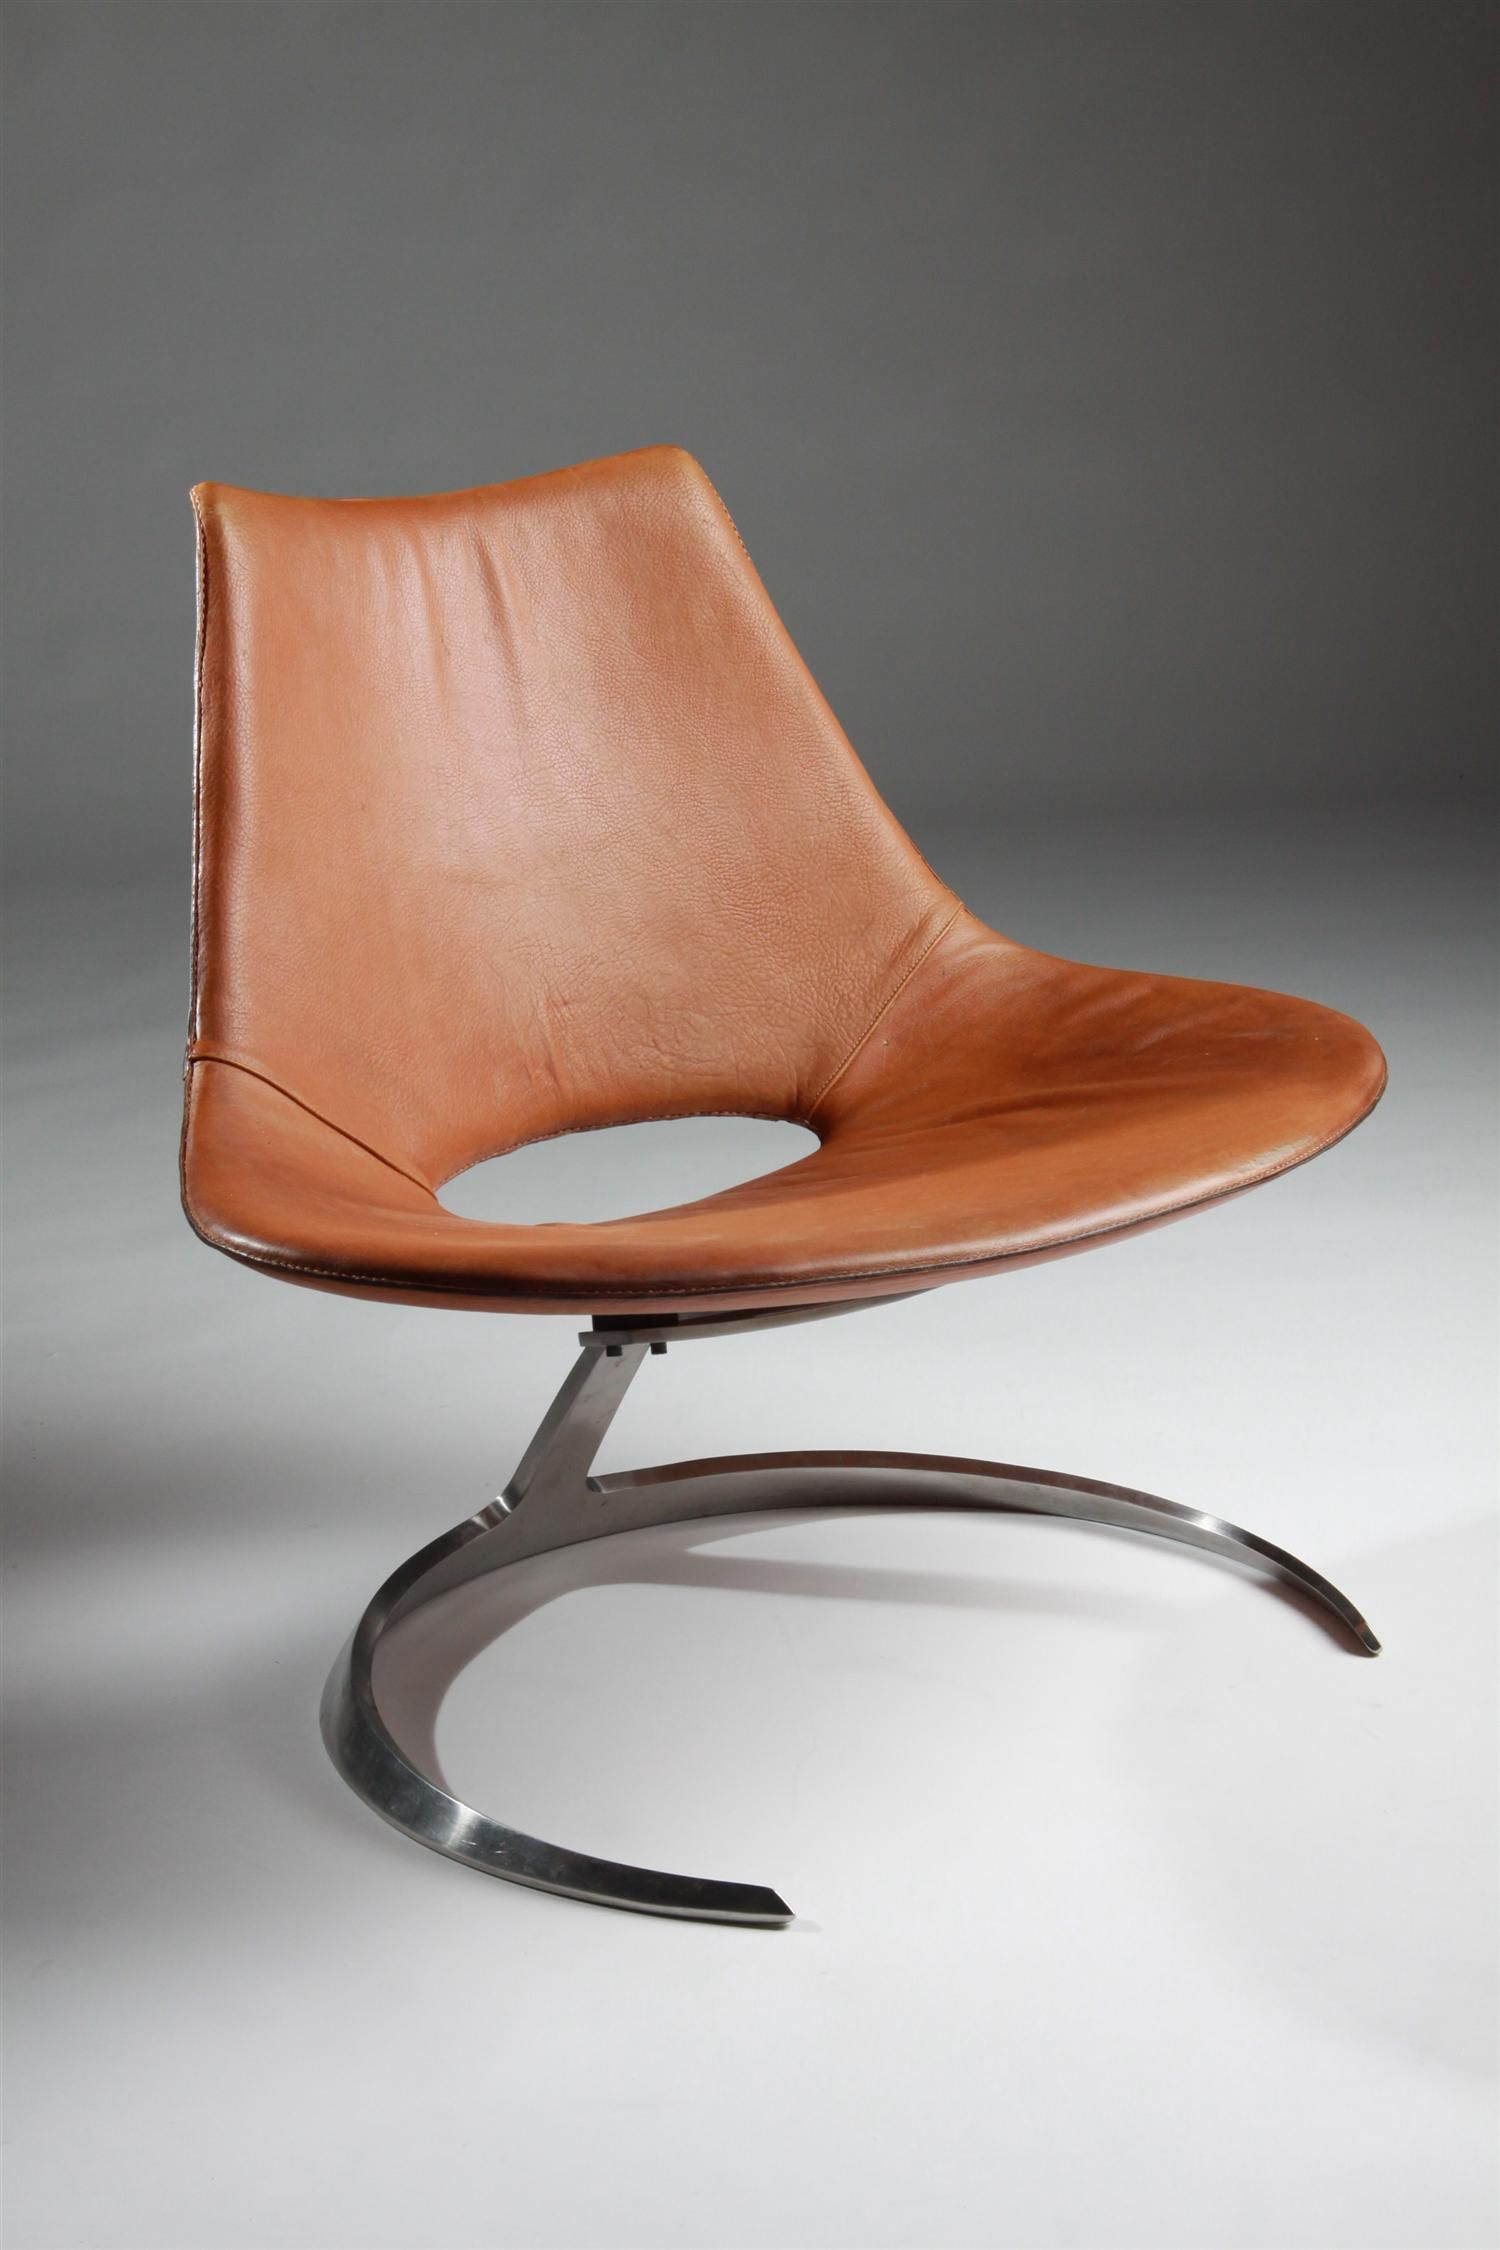 Jörgen Kastholm and Preben Fabricius; Leather and Chromed Steel 'Scimitar' Chair for Ivan Schlecter, 1963.